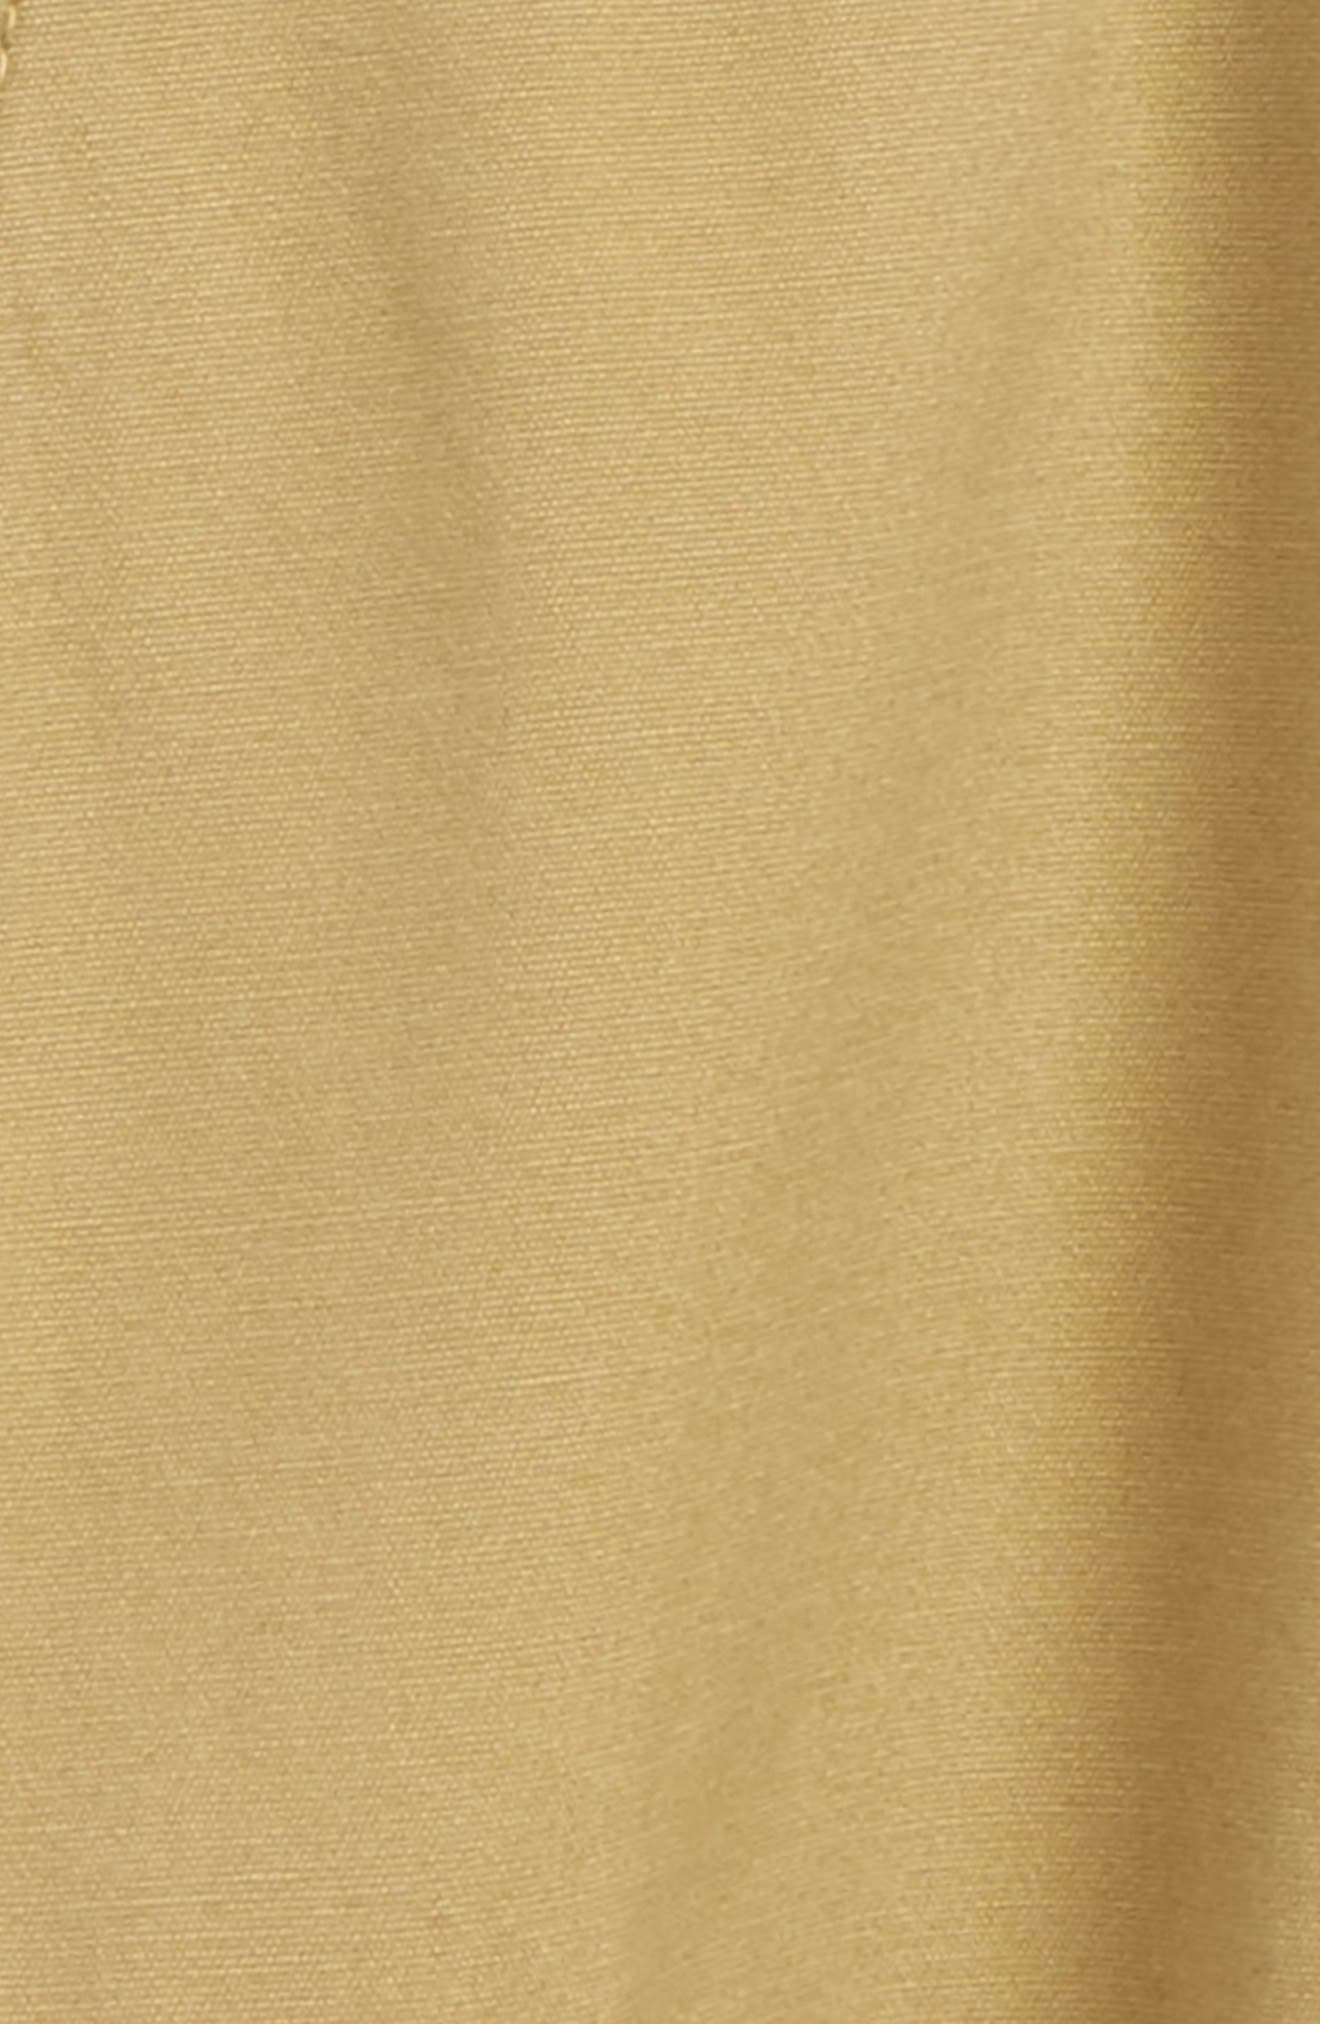 Ribbed Waist Utility Shorts,                             Alternate thumbnail 3, color,                             Tan Kelp